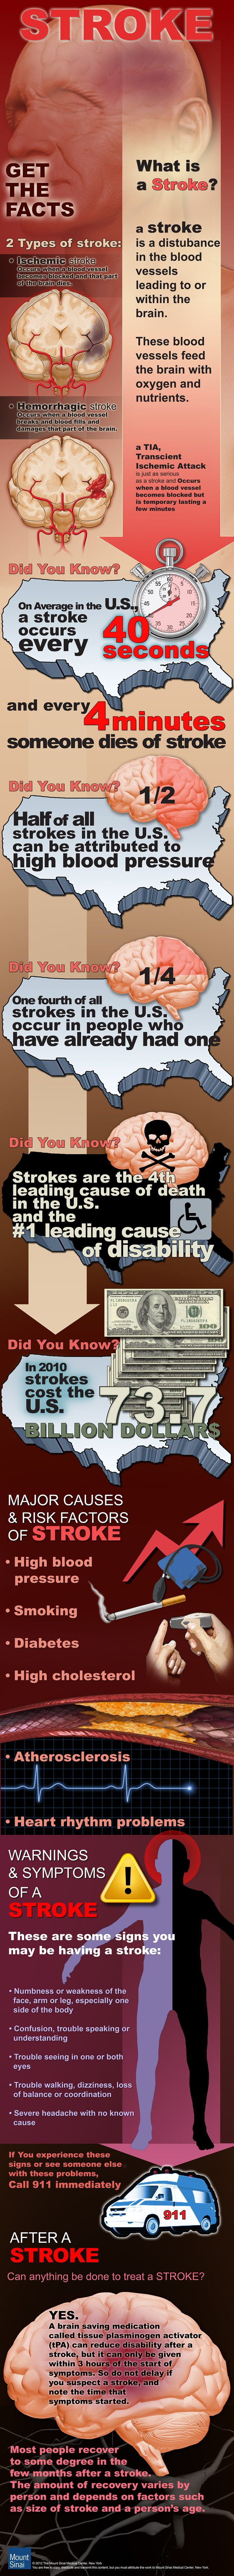 #Stroke #Infographic - #Prehypertension increases risk of stroke